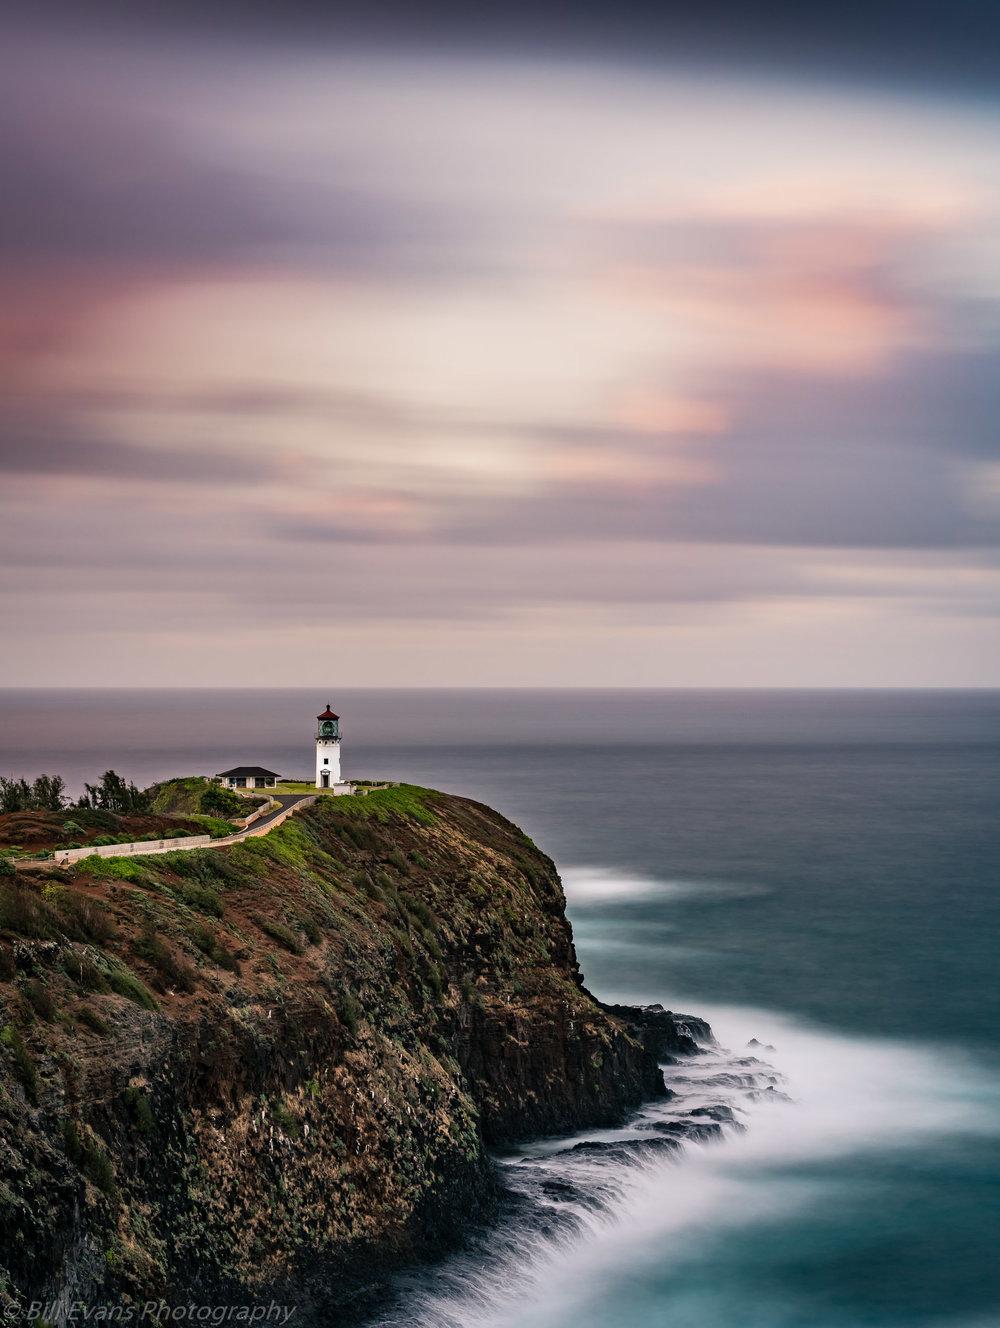 Image No. 4 - Kilauea Lighthouse (Kauai, Hawaii)   Sony A7Rii + Sony FE 55mm Reflex (132s @ f/11 iso 100)